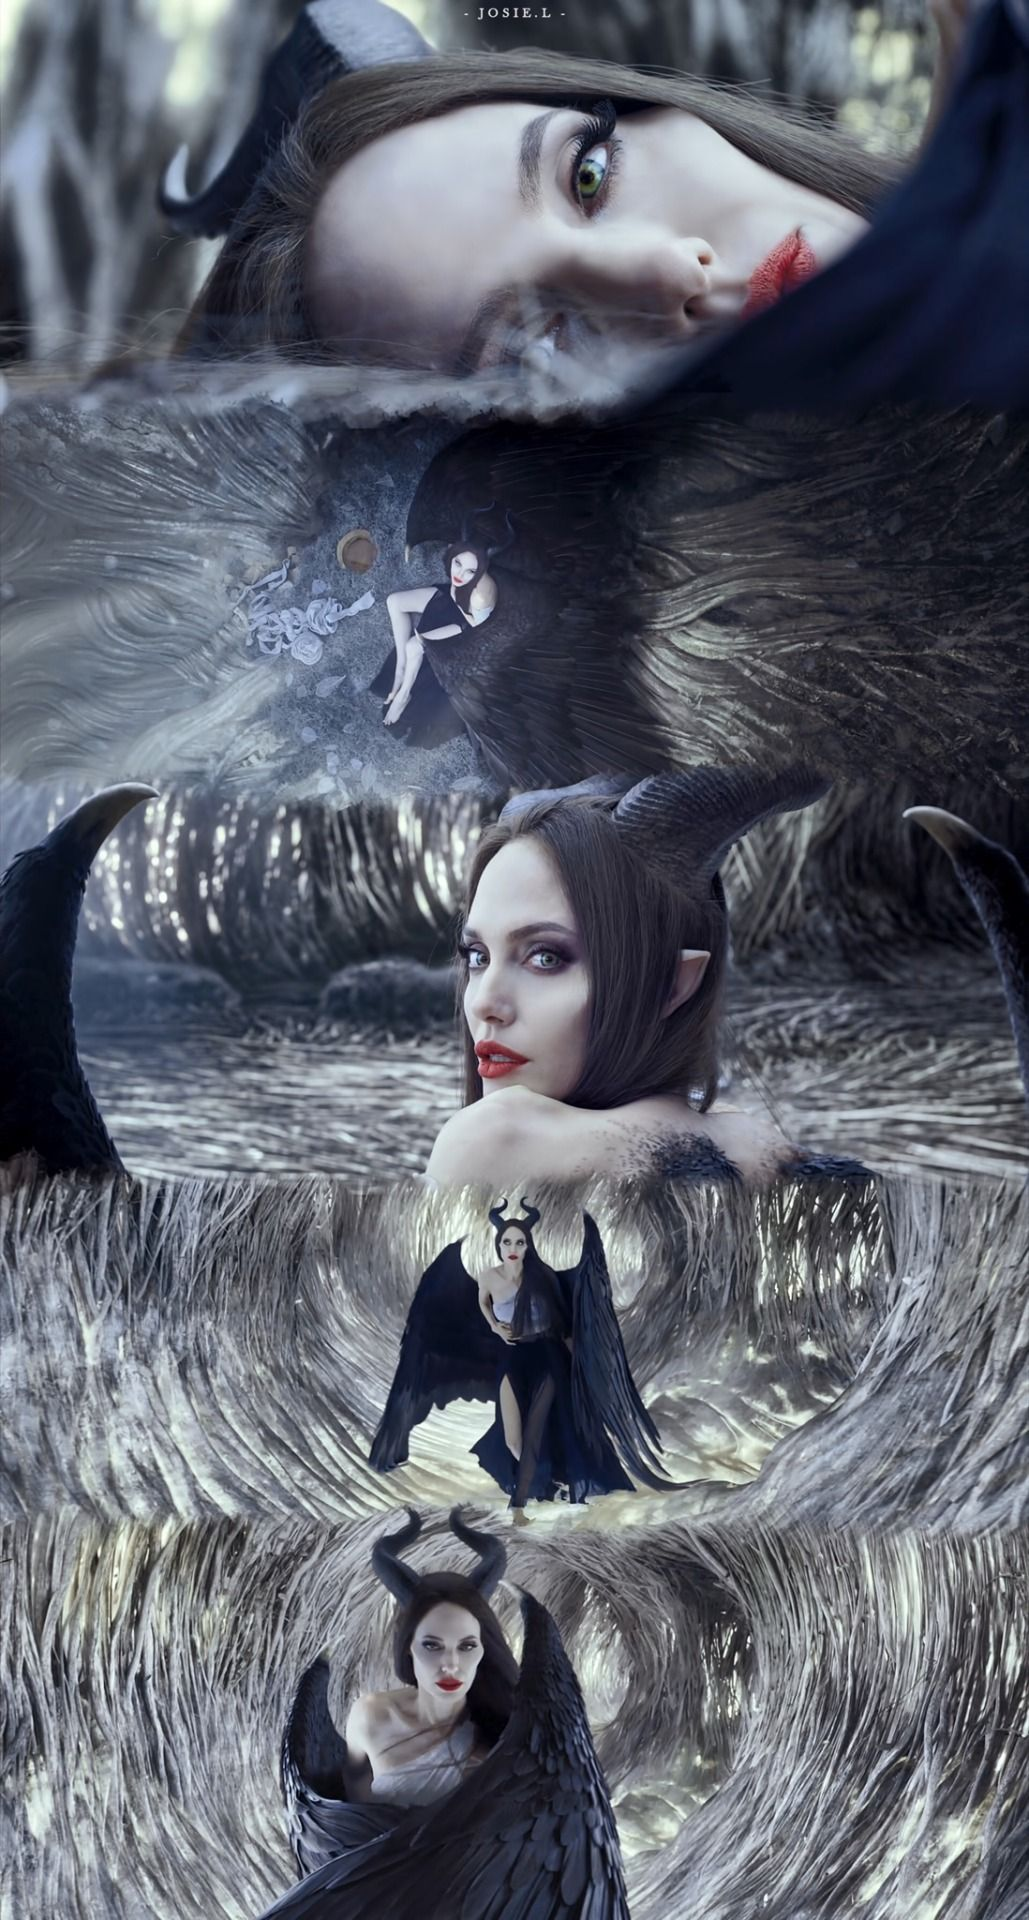 Angelina Jolie Angelina Jolie On Her Parenting Style Being Angelina Jolie Maleficent Maleficent Movie Disney Maleficent